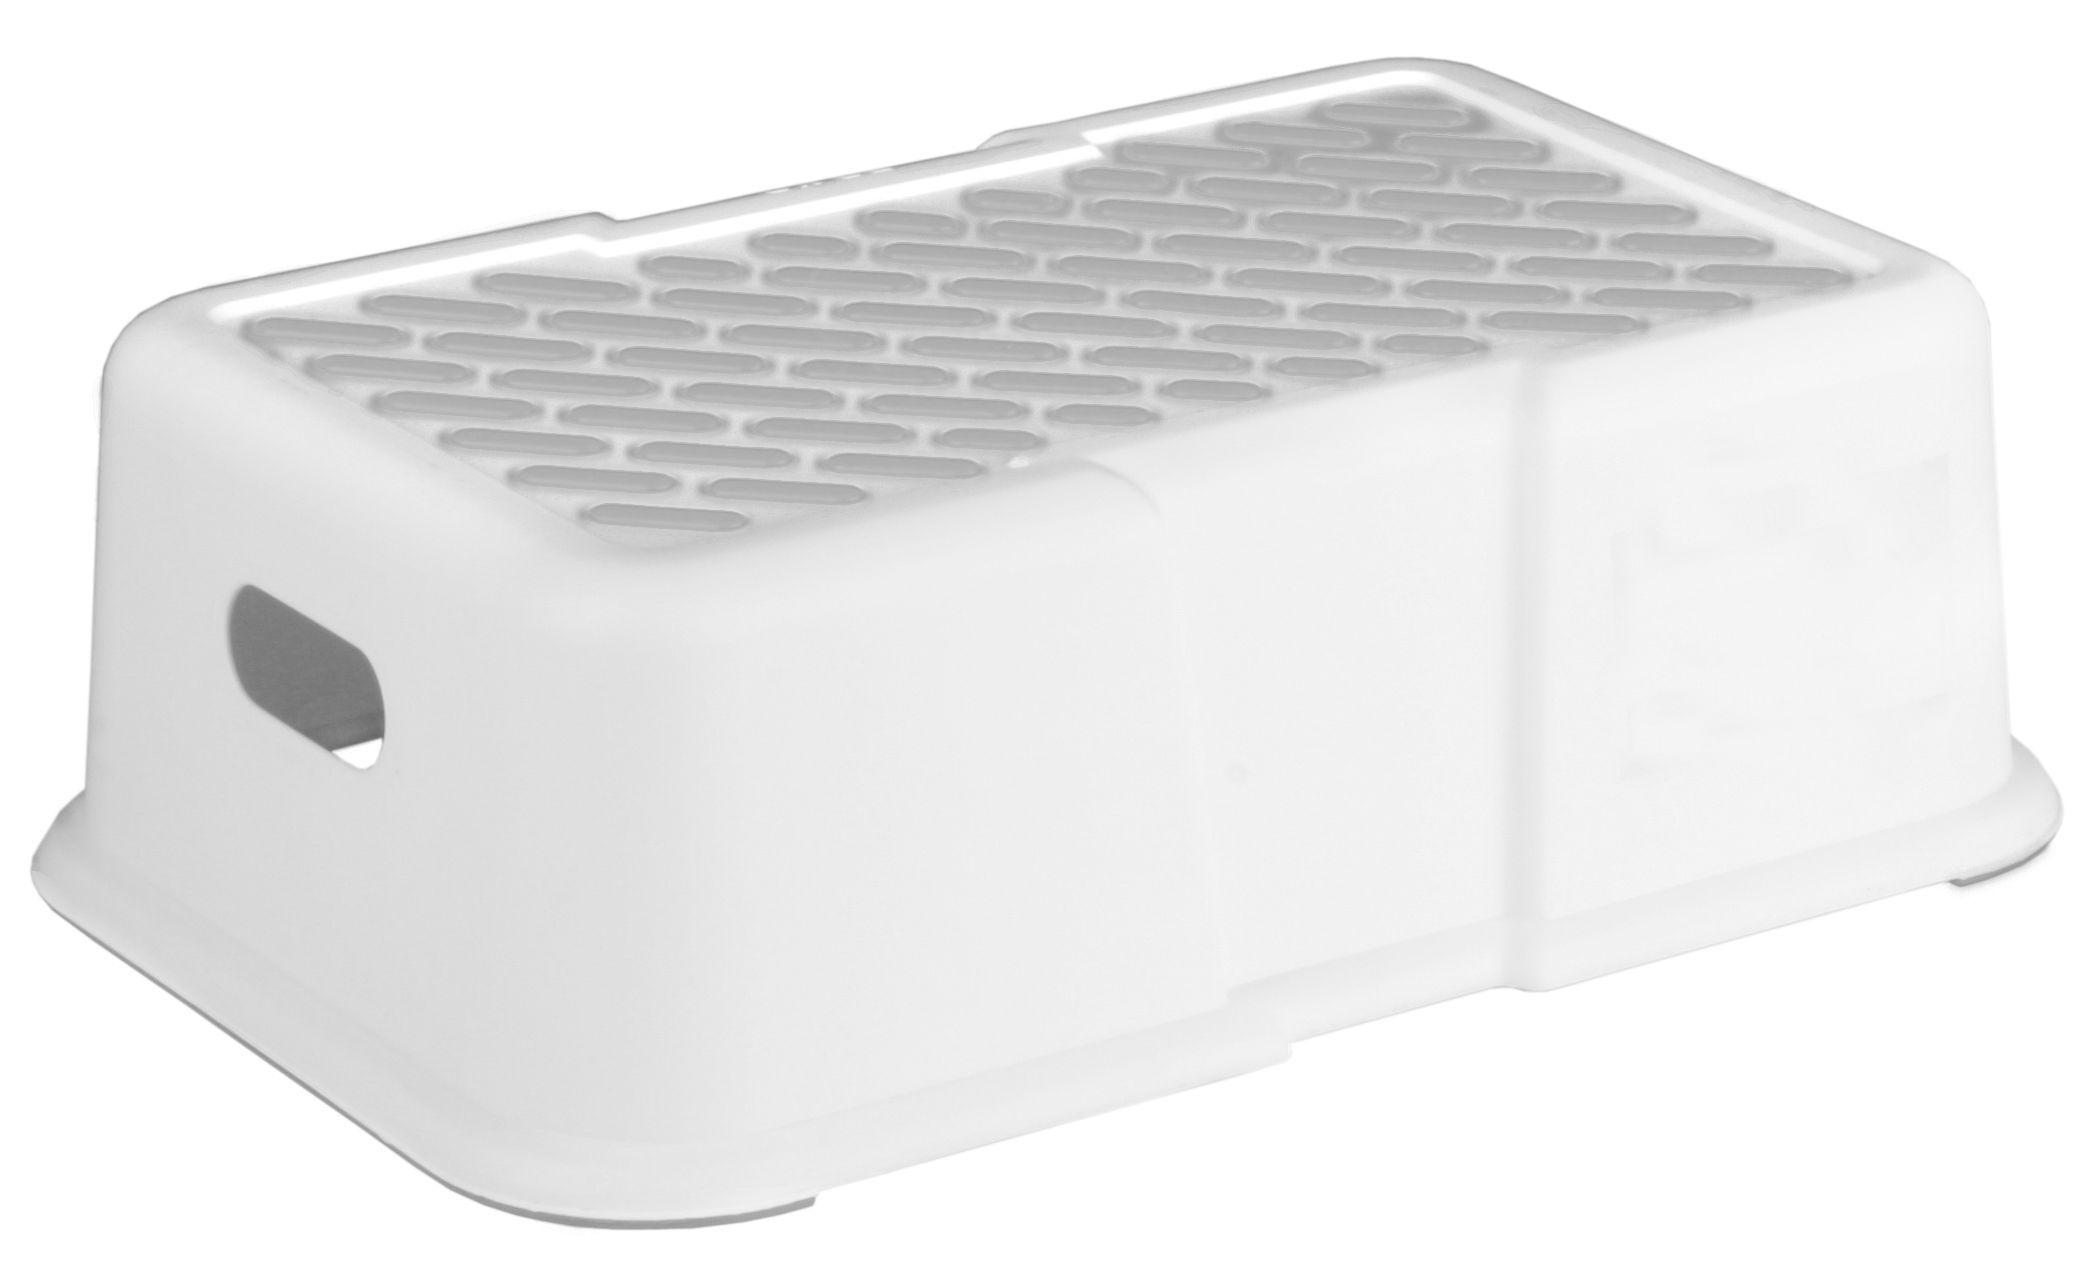 Skammel m. anti-skrid fra Plast Team - Hvid